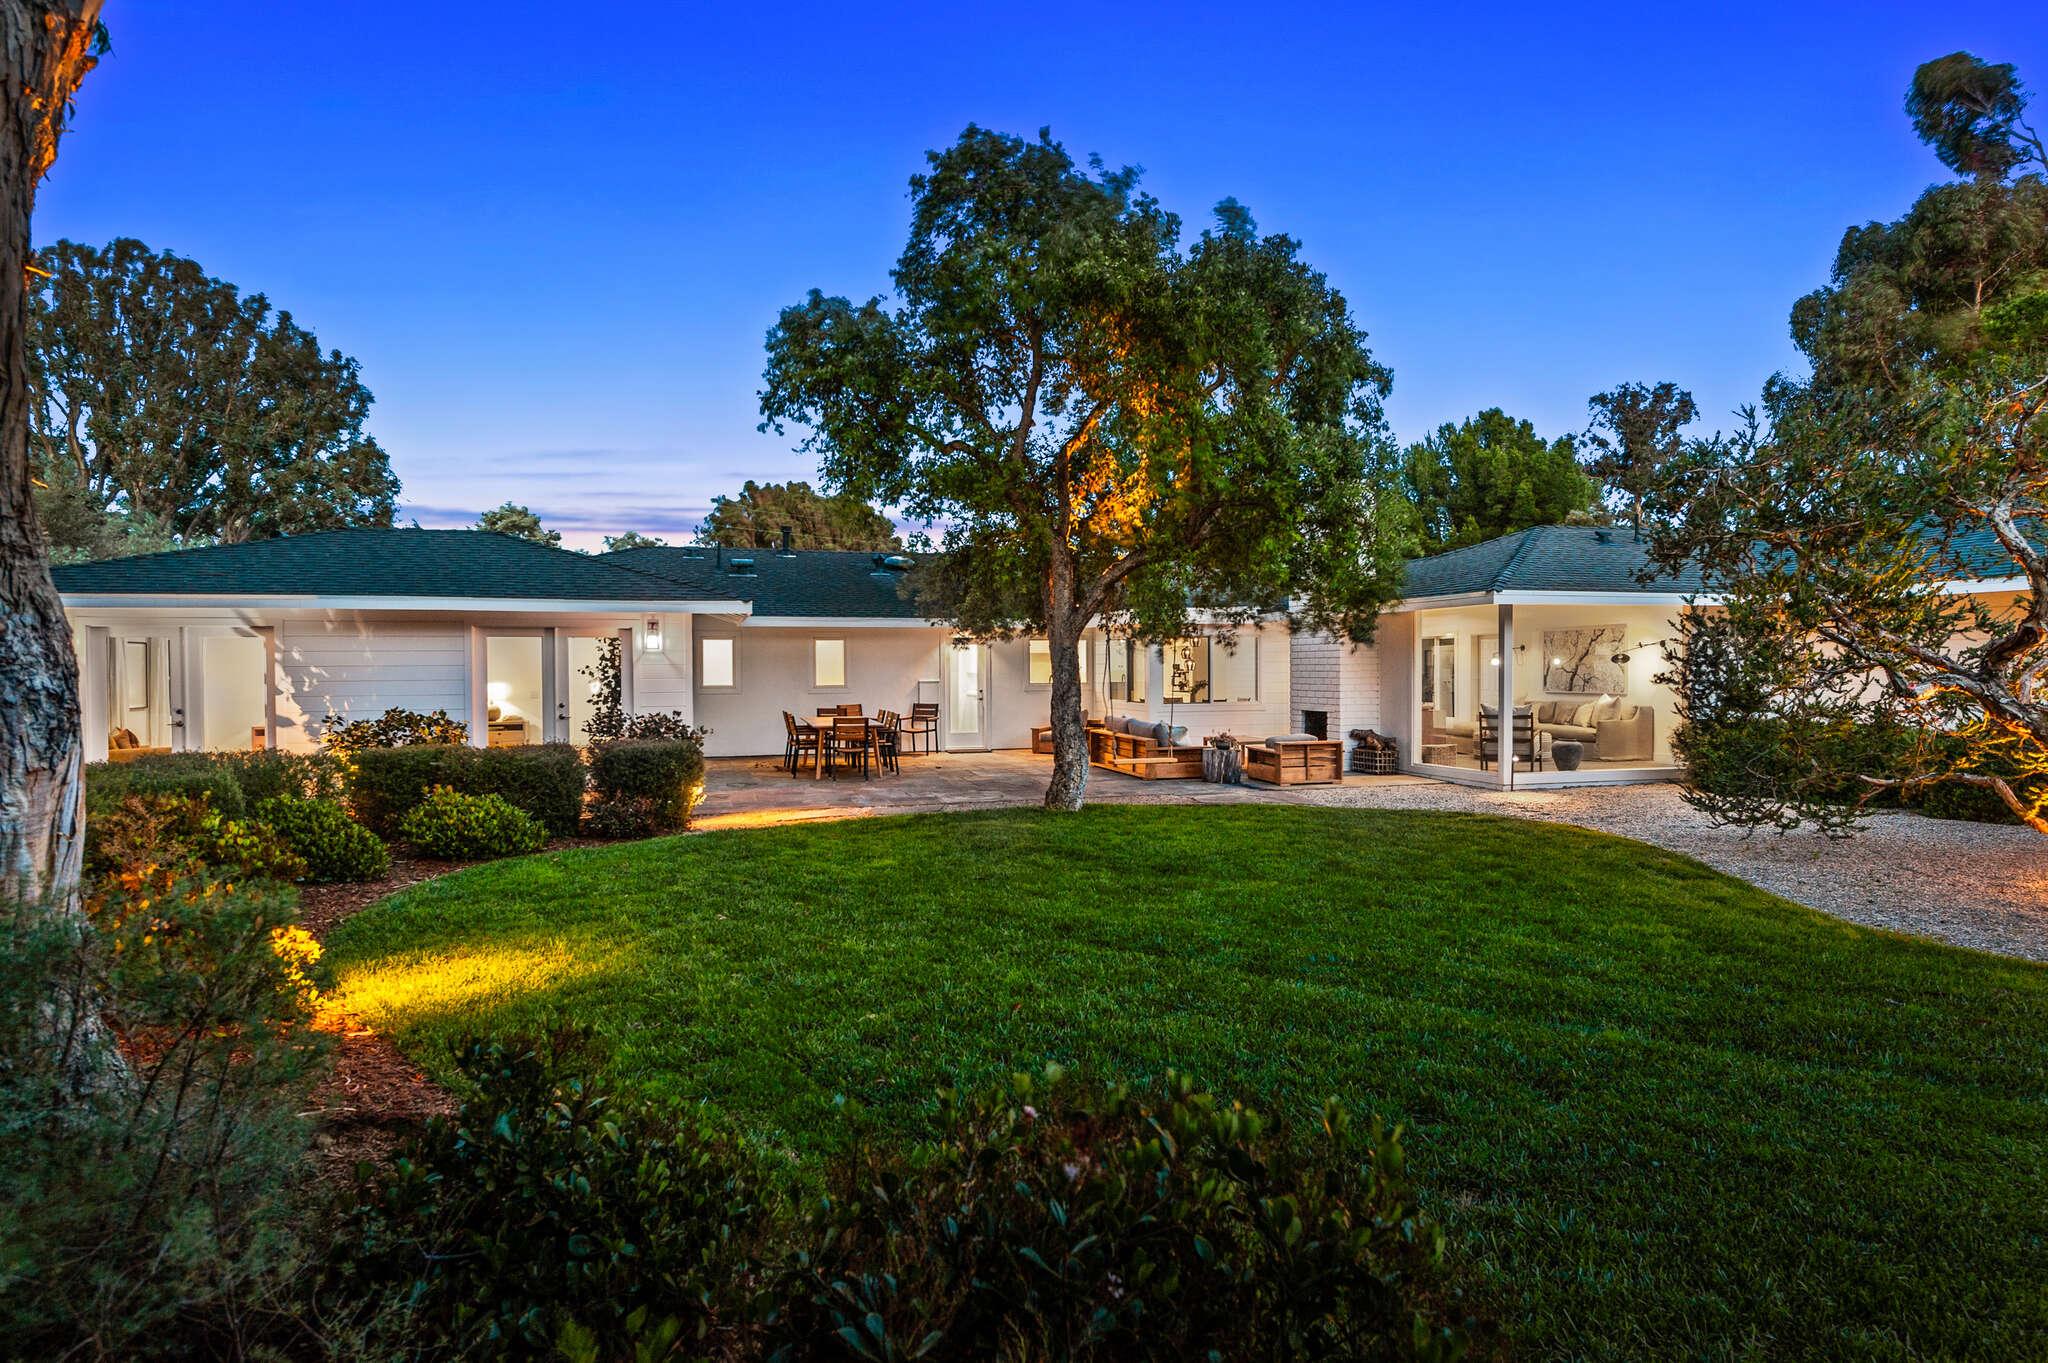 Single Family for Sale at 28730 Grayfox Street Malibu, California 90265 United States